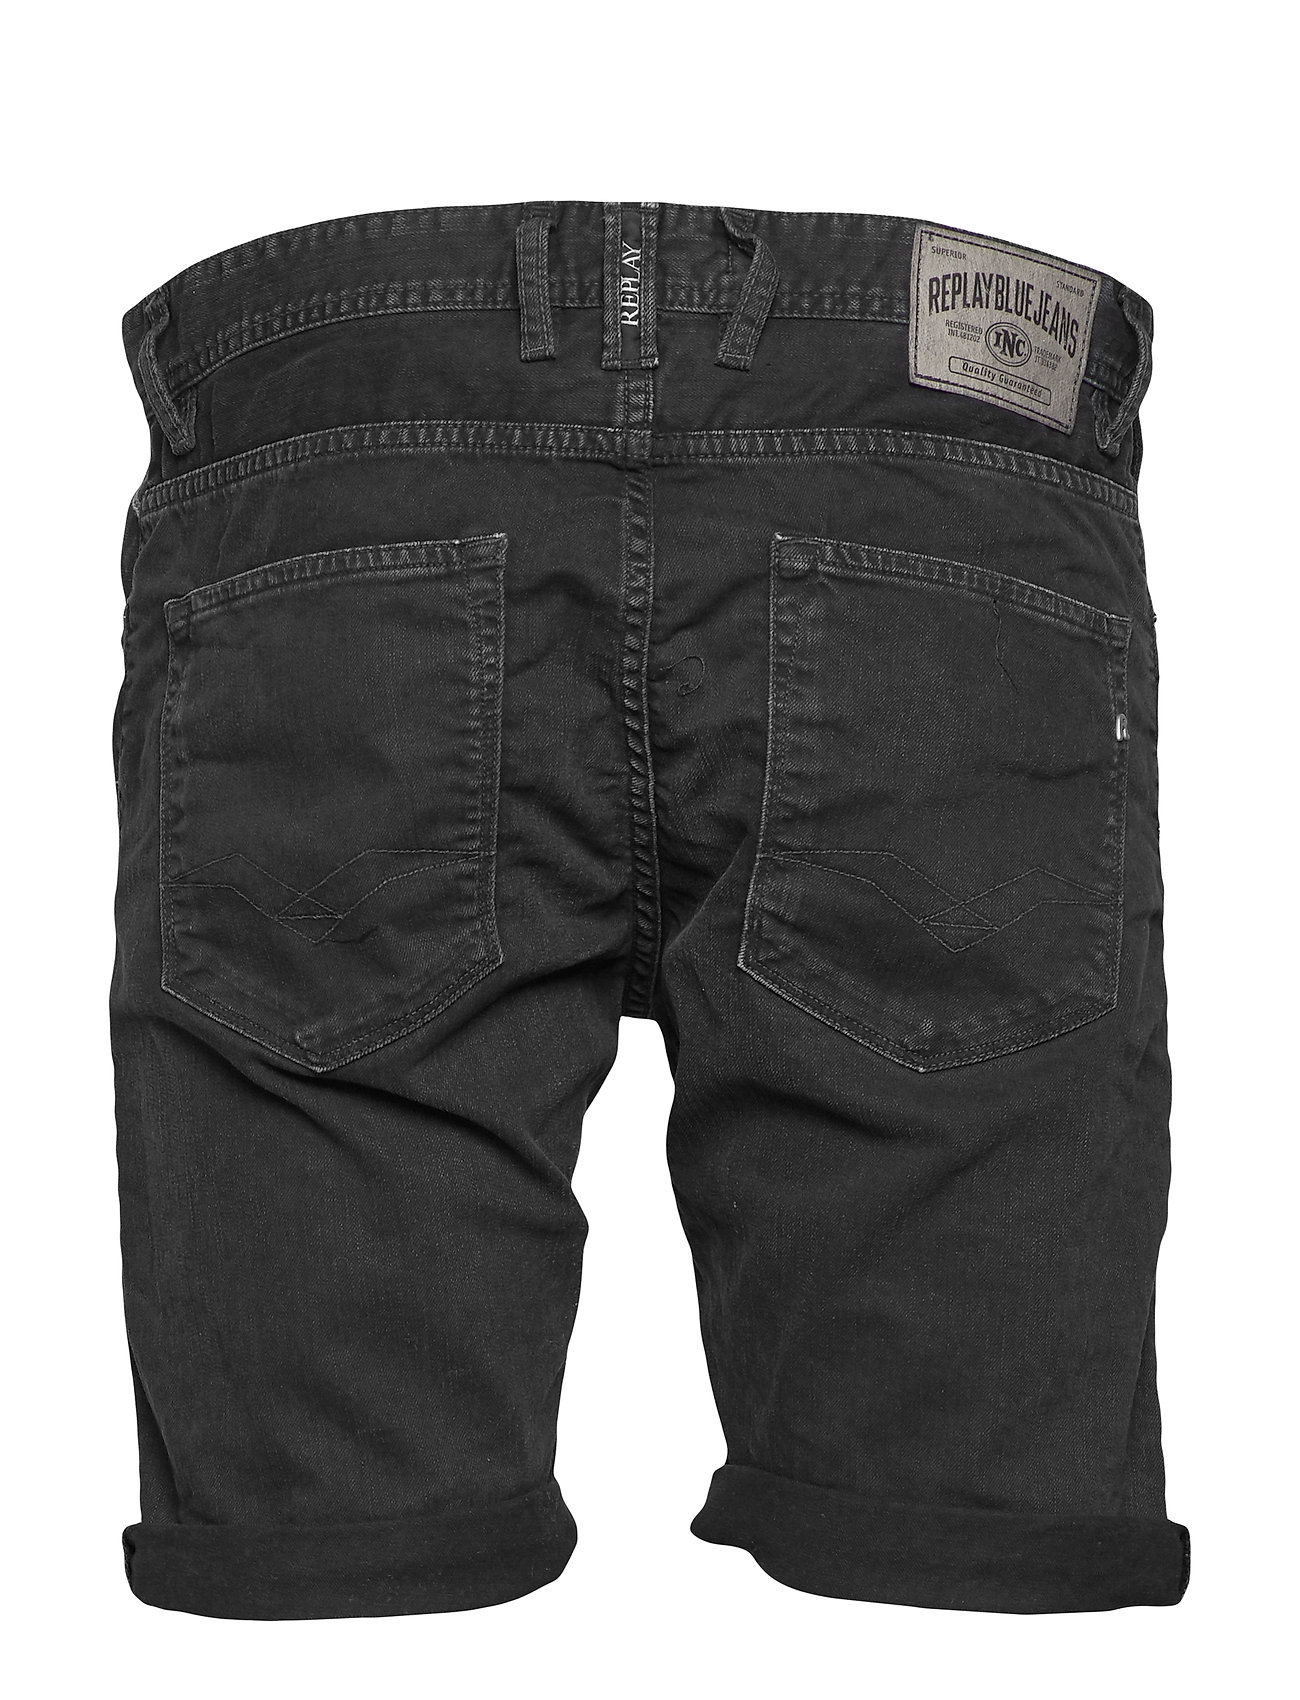 Replay - RBJ.901 SHORT - denim shorts - black delavÈ - 1